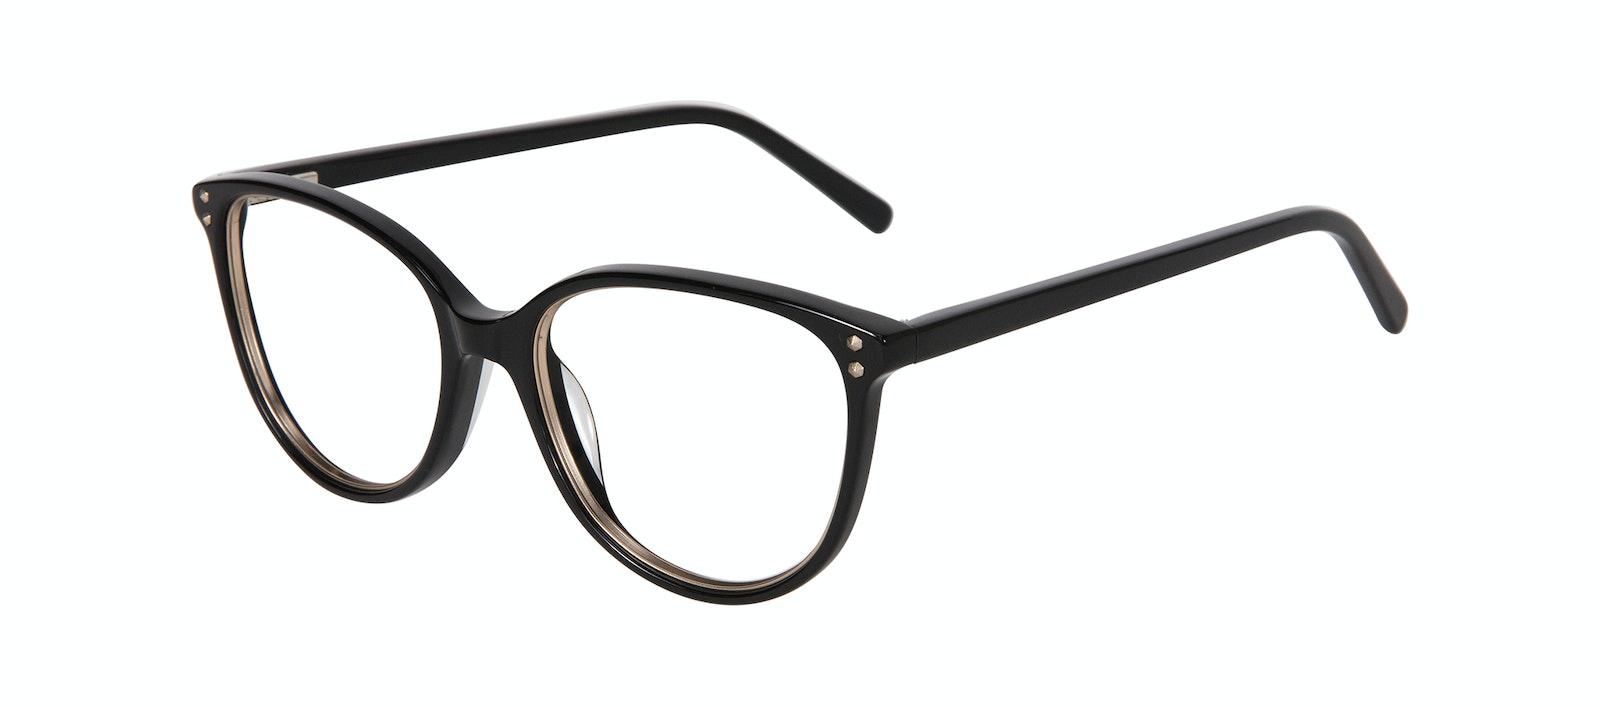 Affordable Fashion Glasses Cat Eye Eyeglasses Women Imagine Petite Shine Onyx Tilt